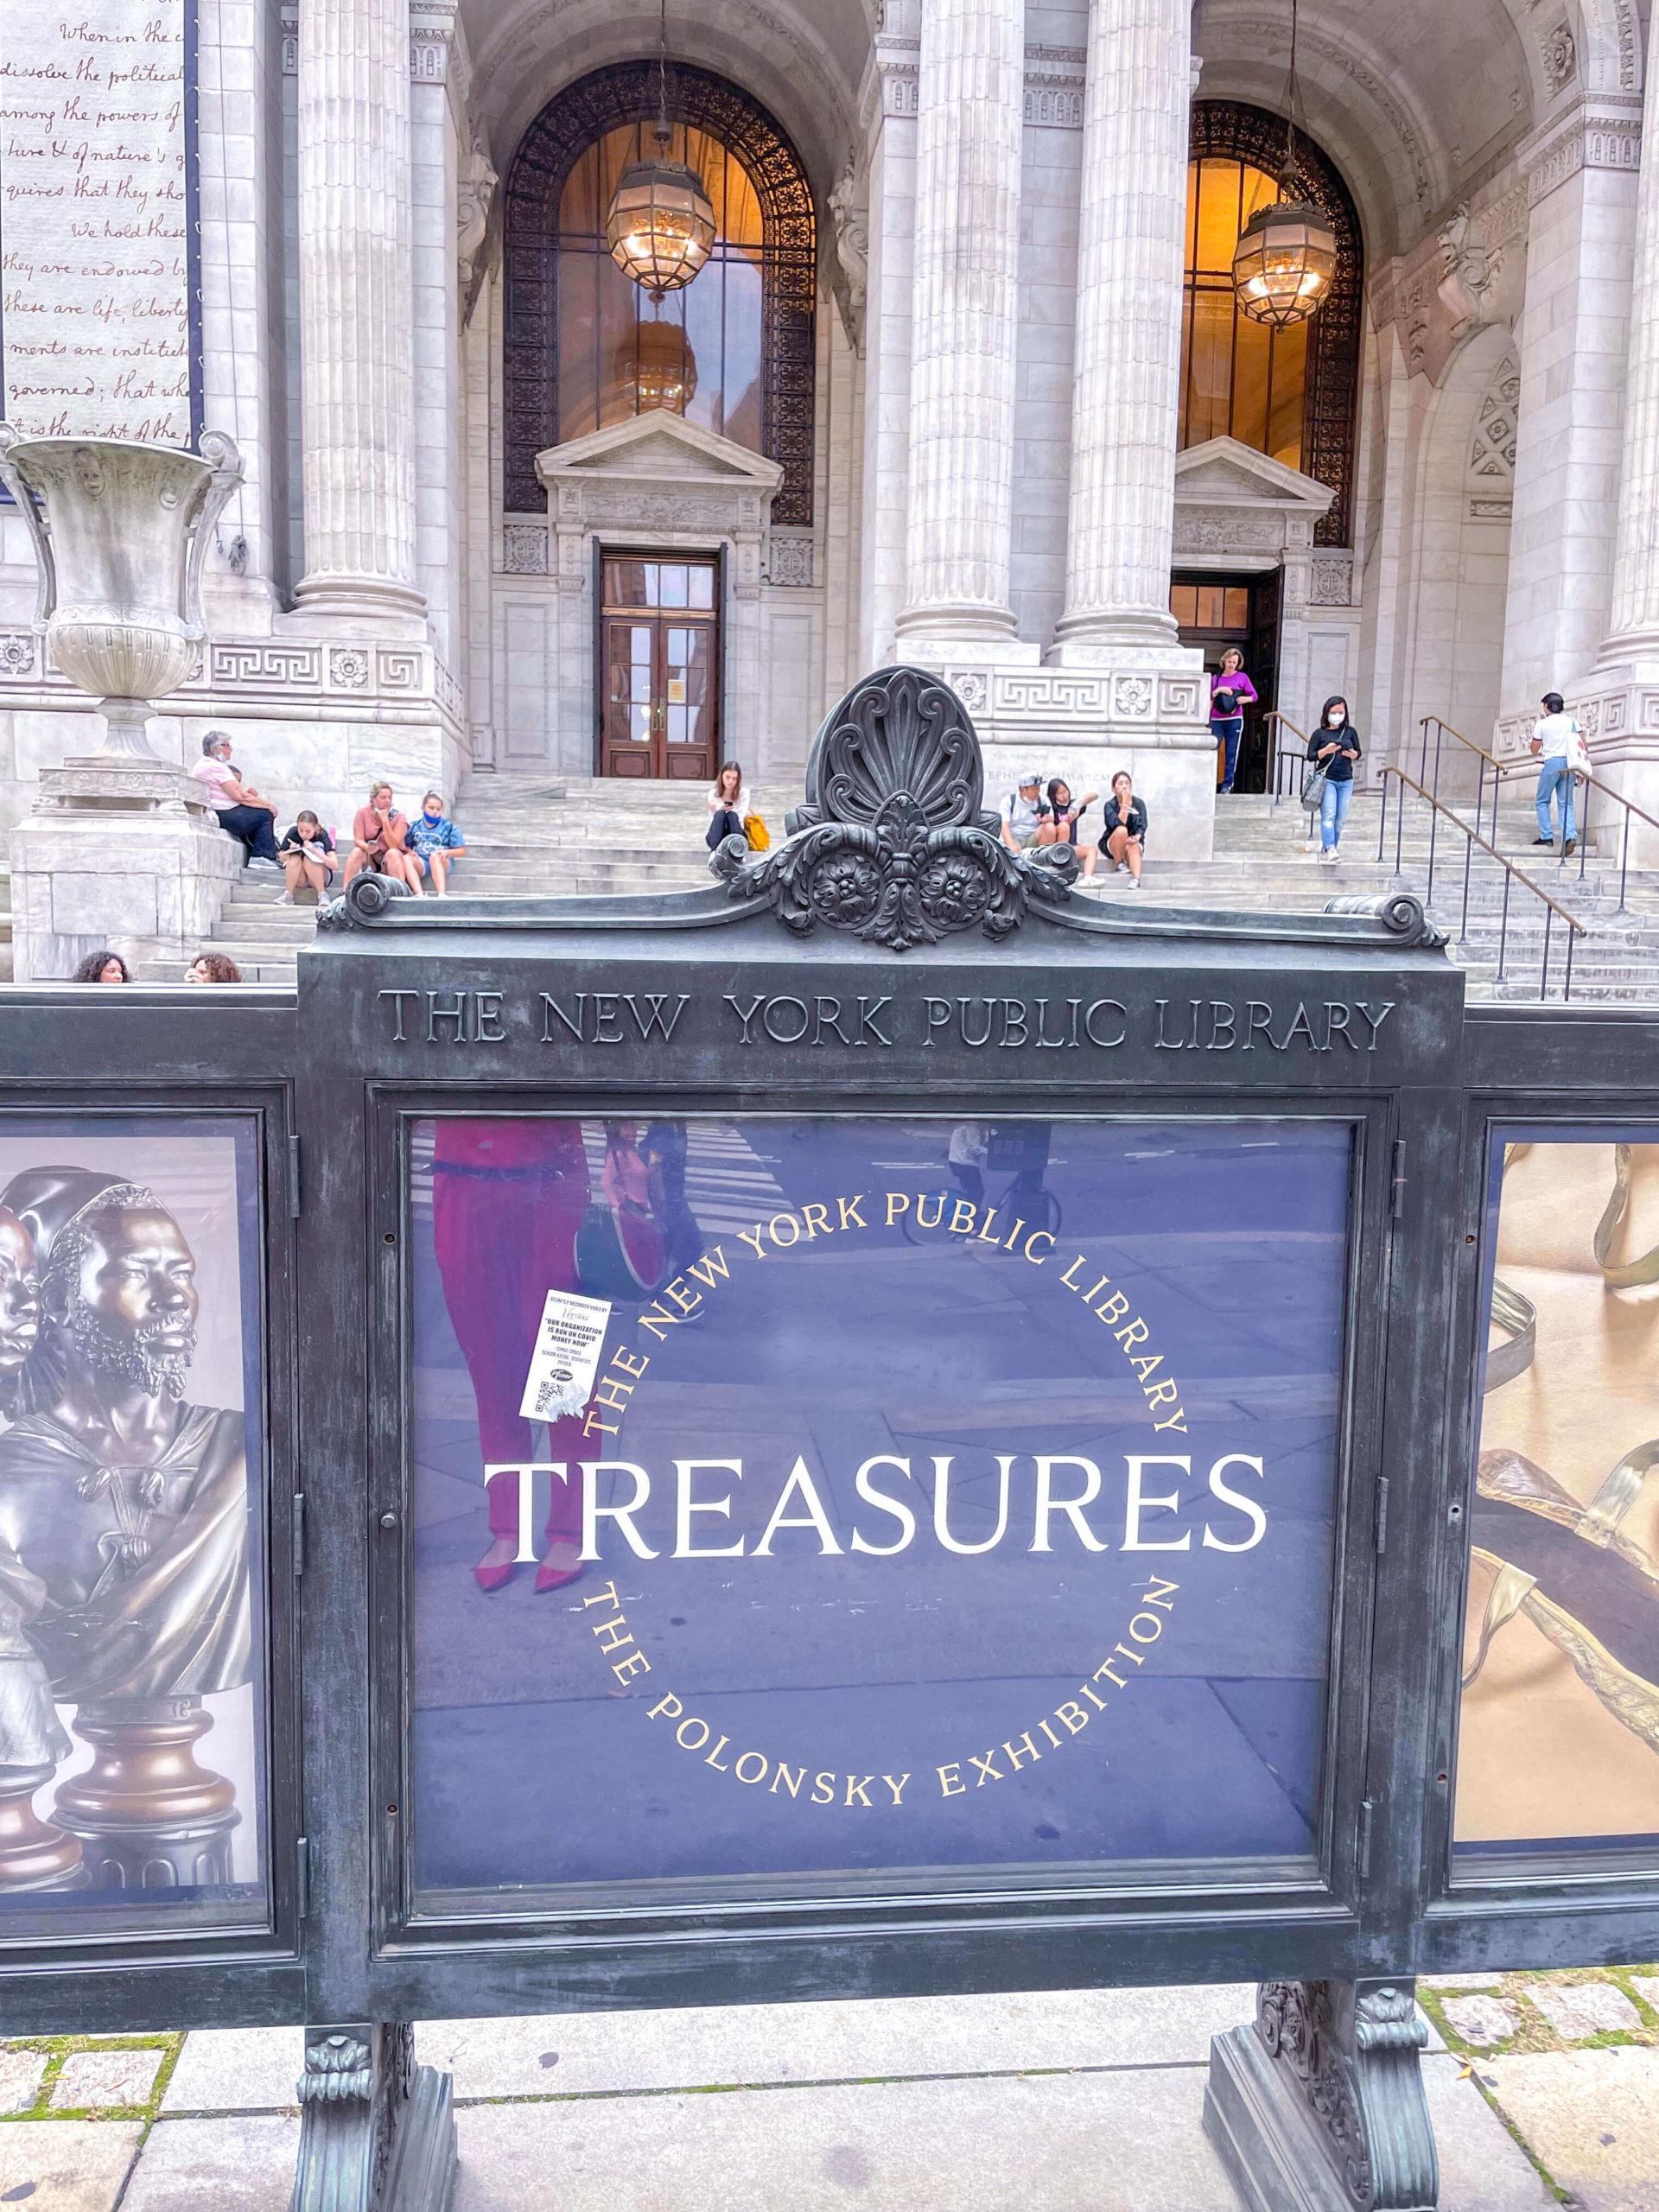 Visitare la New York Public Library, treasures